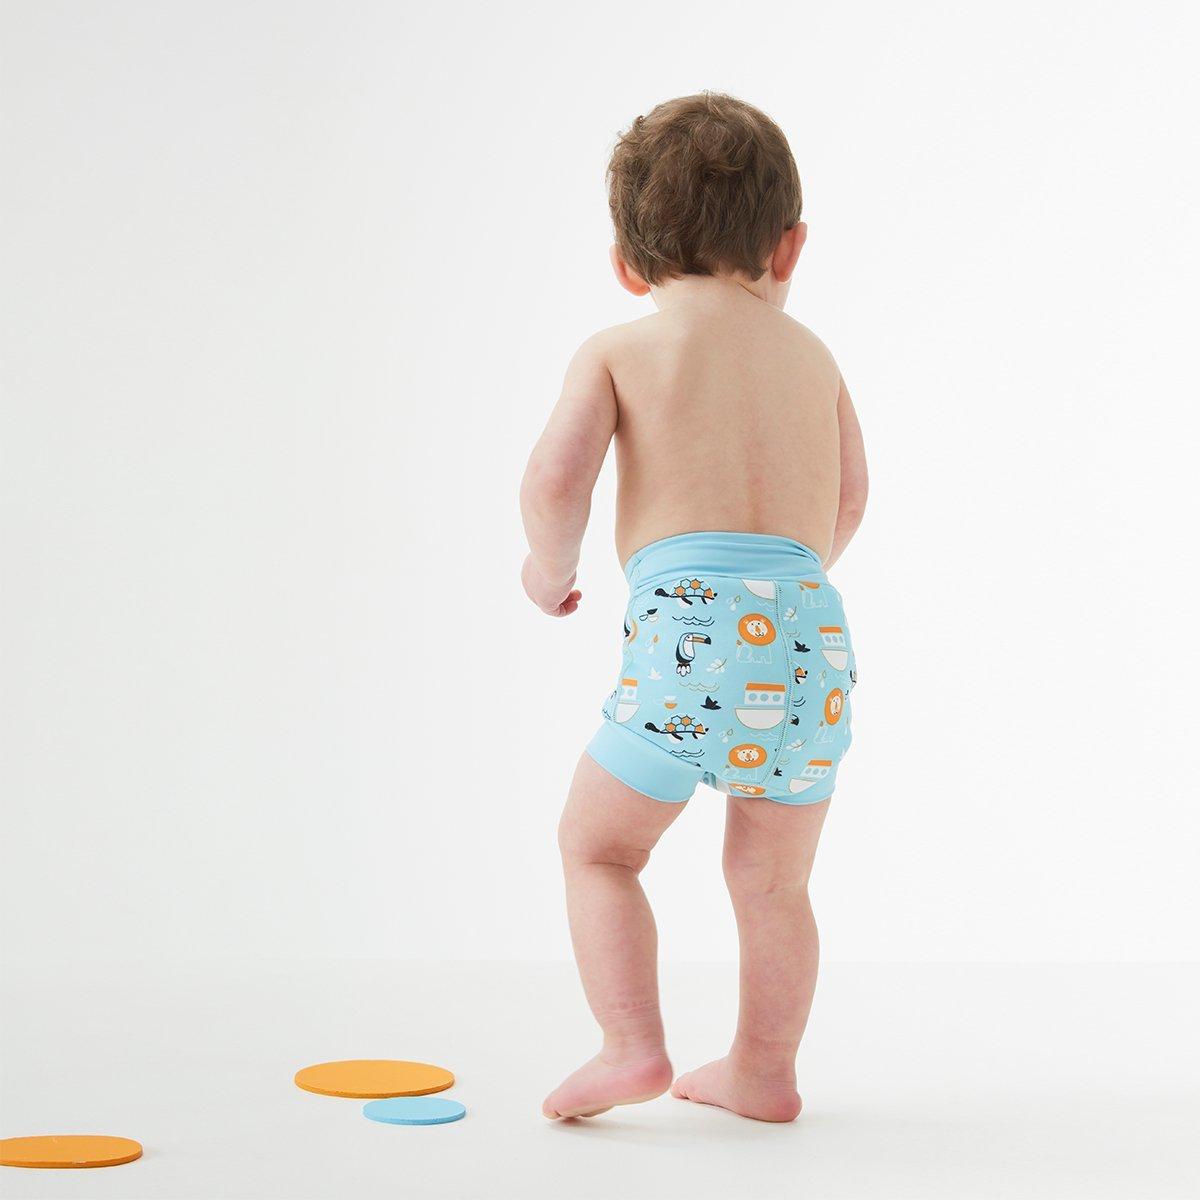 Splash-About-Happy-Nappy-Baby-amp-Toddler-Swimwear-Nappy-and-Shorts-Sun-Safe thumbnail 25